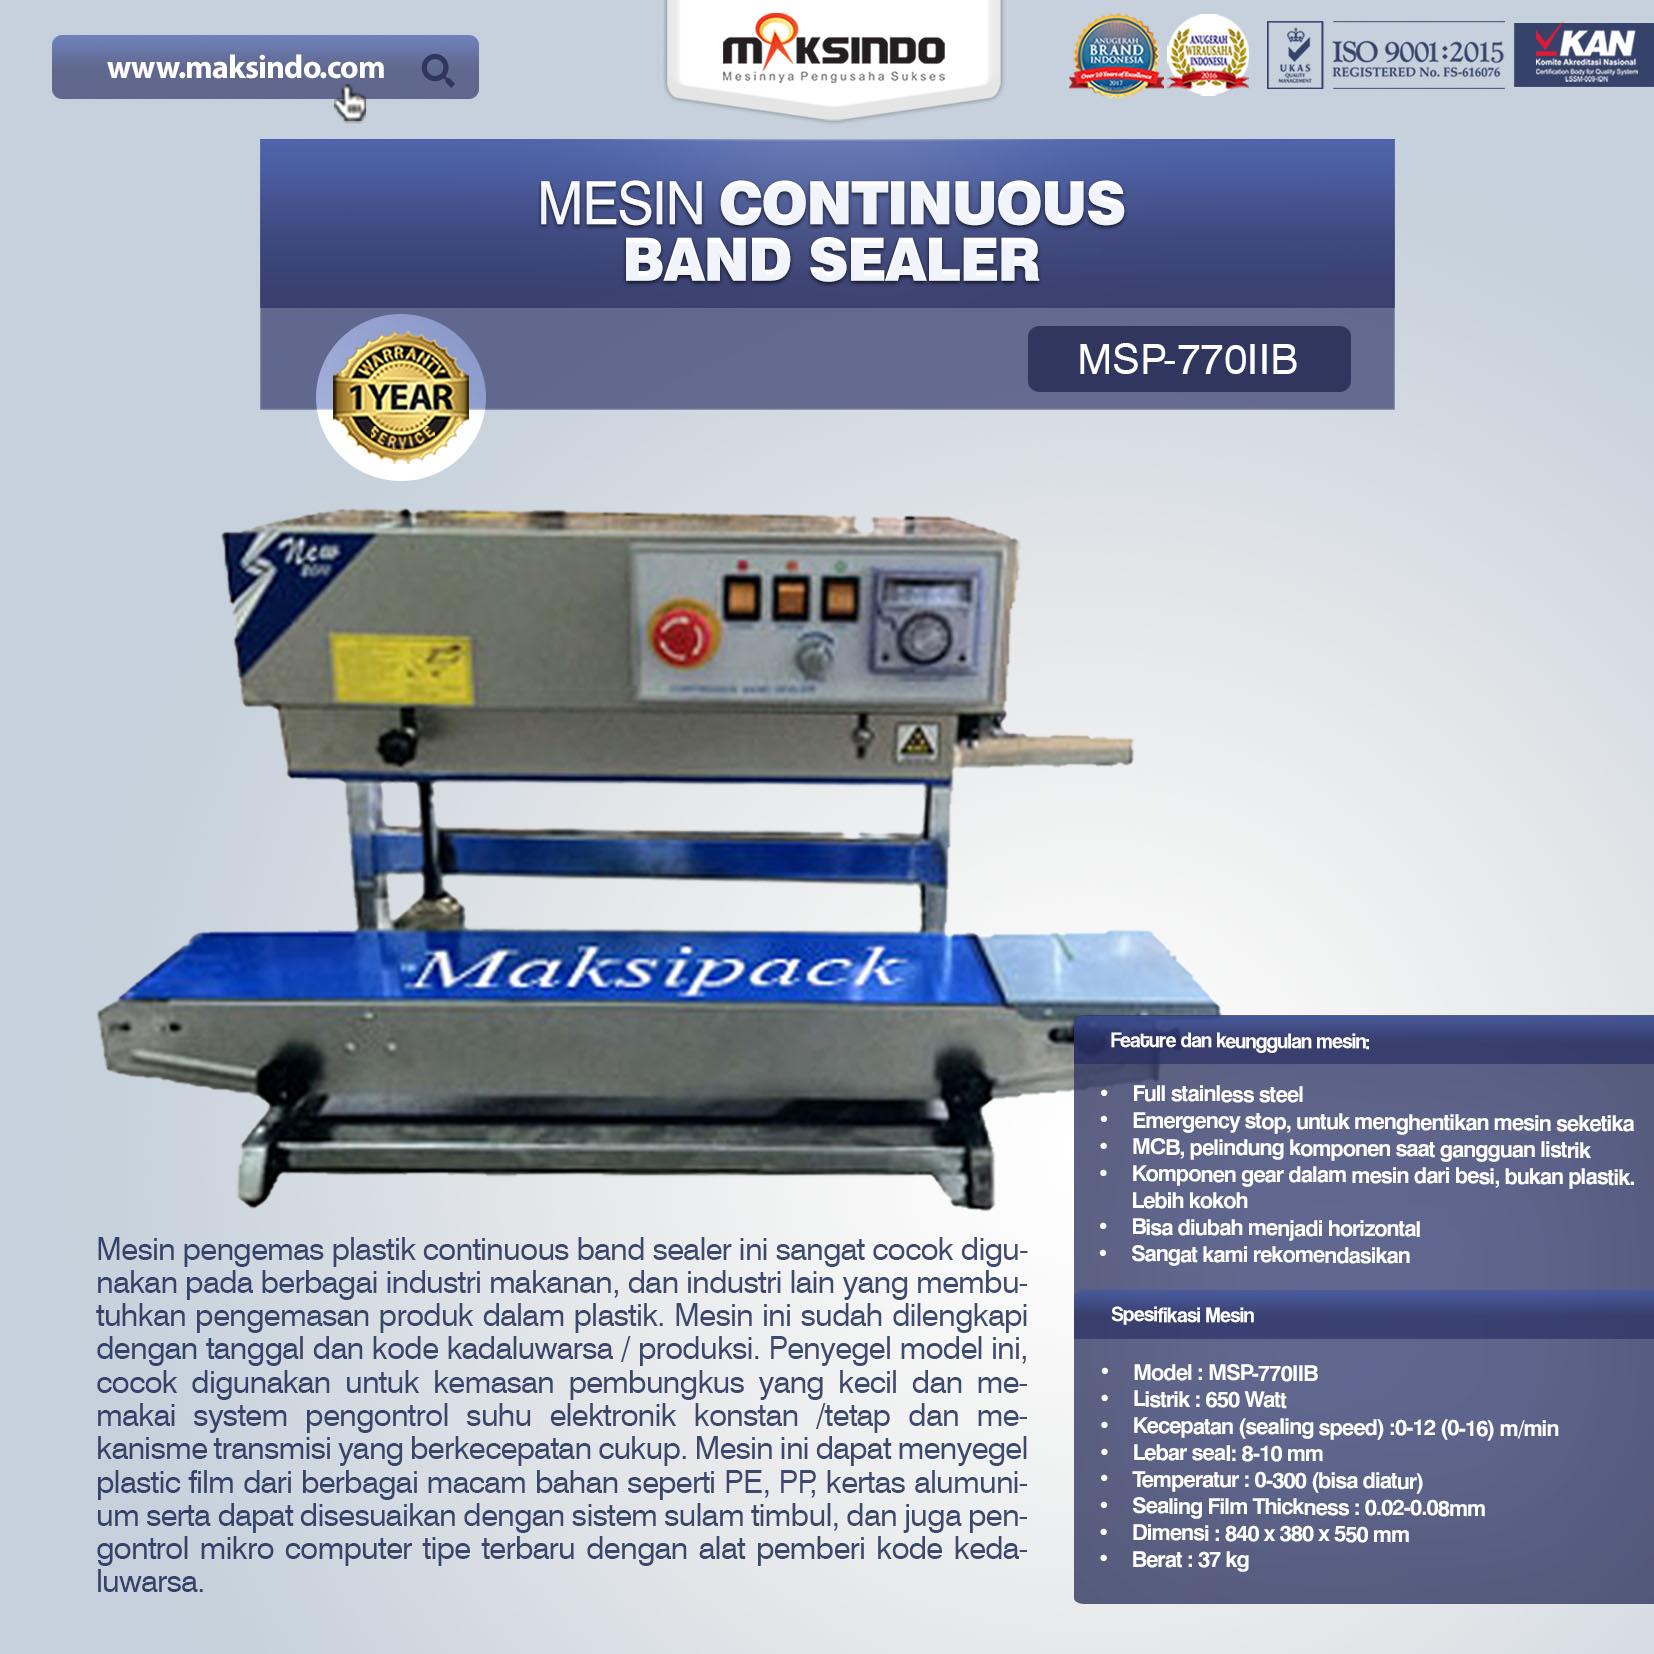 Jual Mesin Continuous Band Sealer MSP-770IIB di Malang